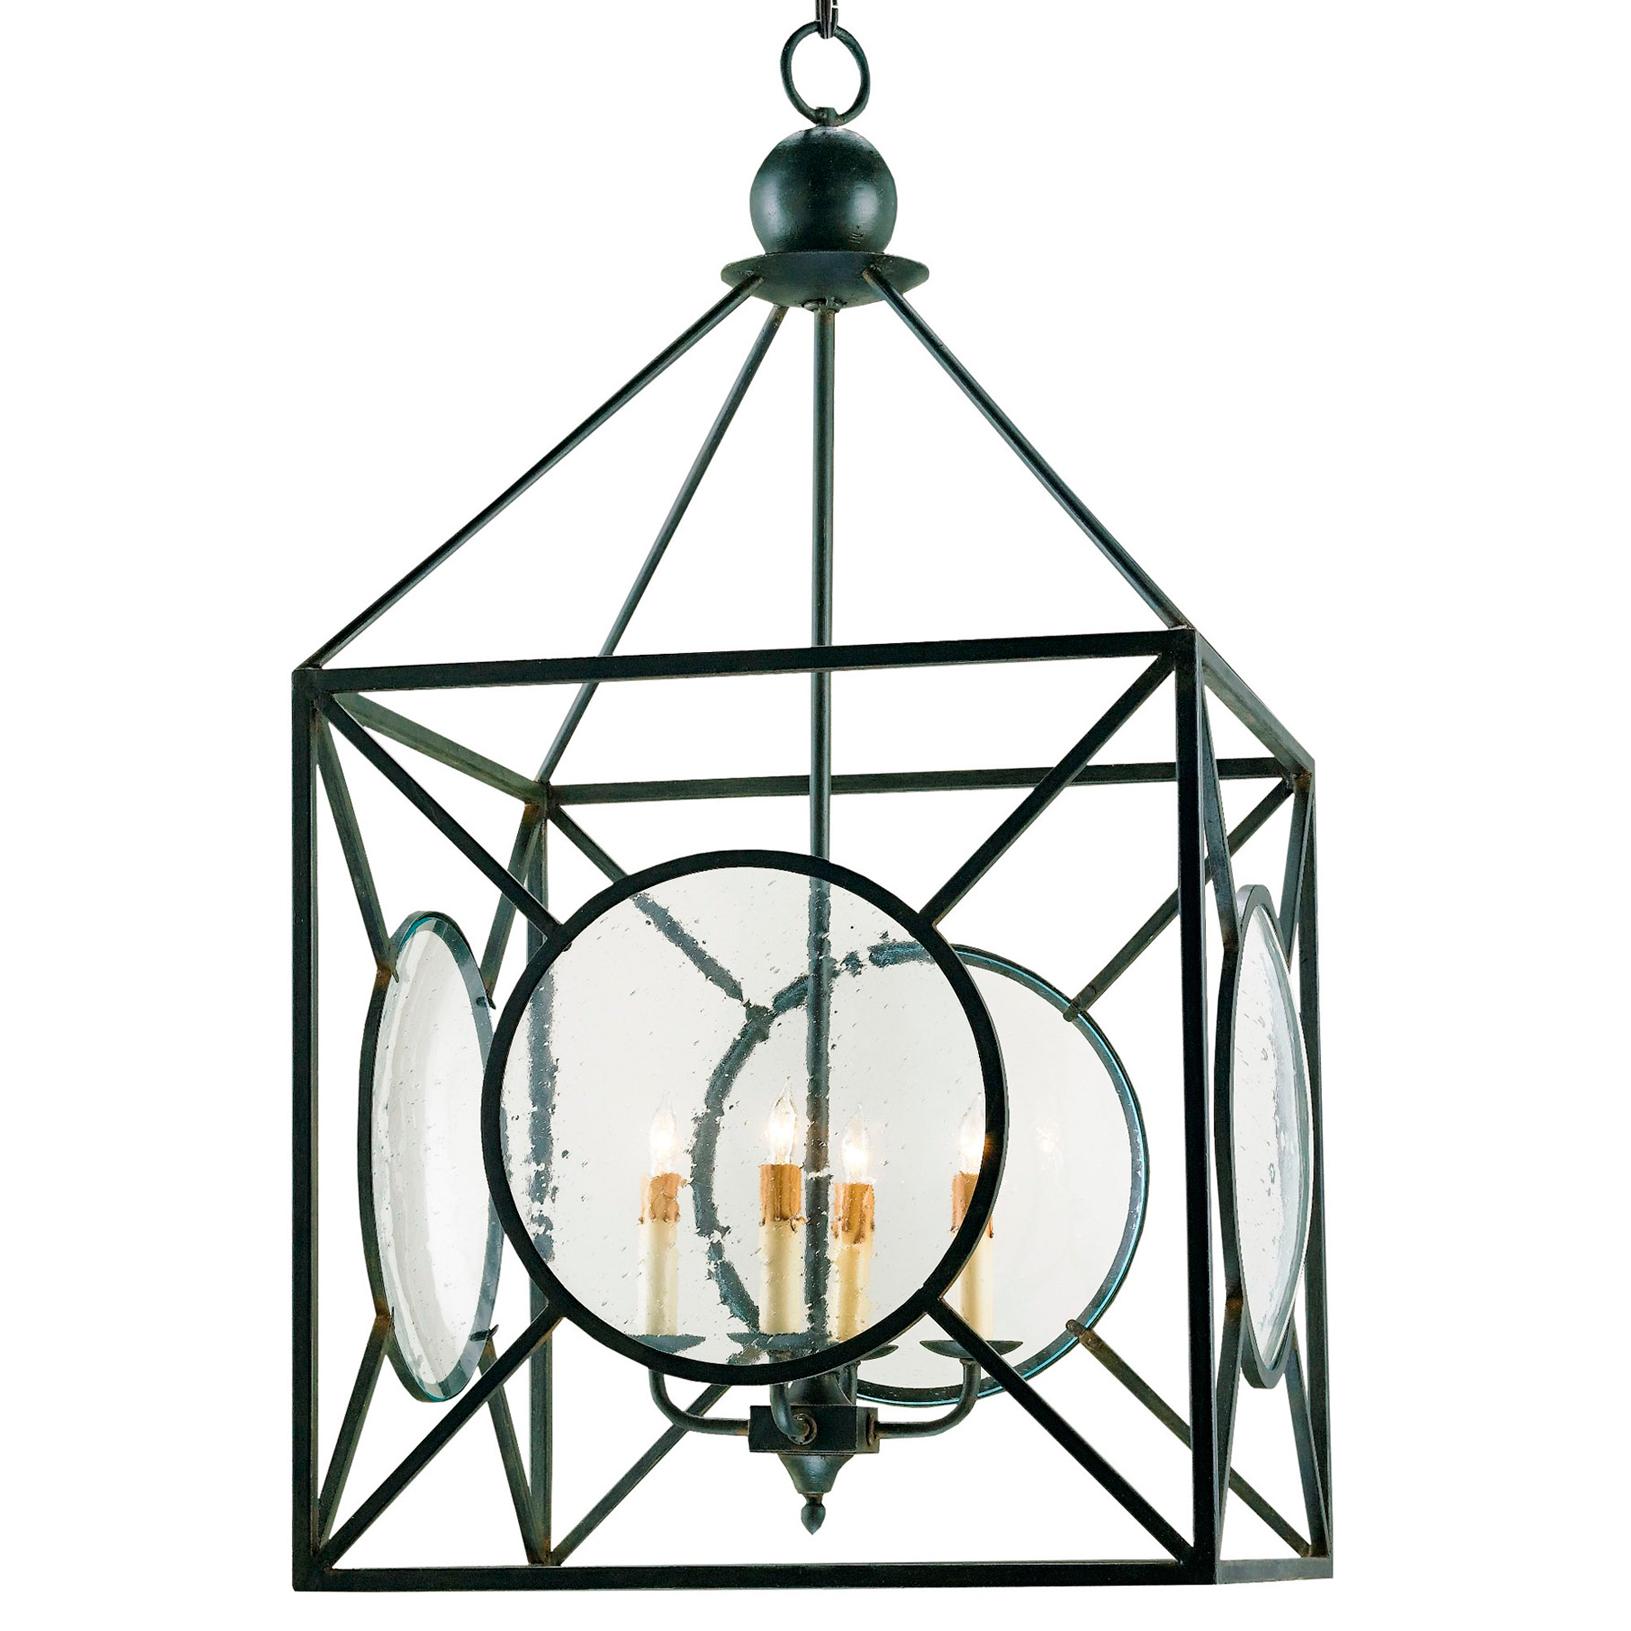 Beckmore Geometric Iron Seeded Glass 4 Light Lantern Pendant